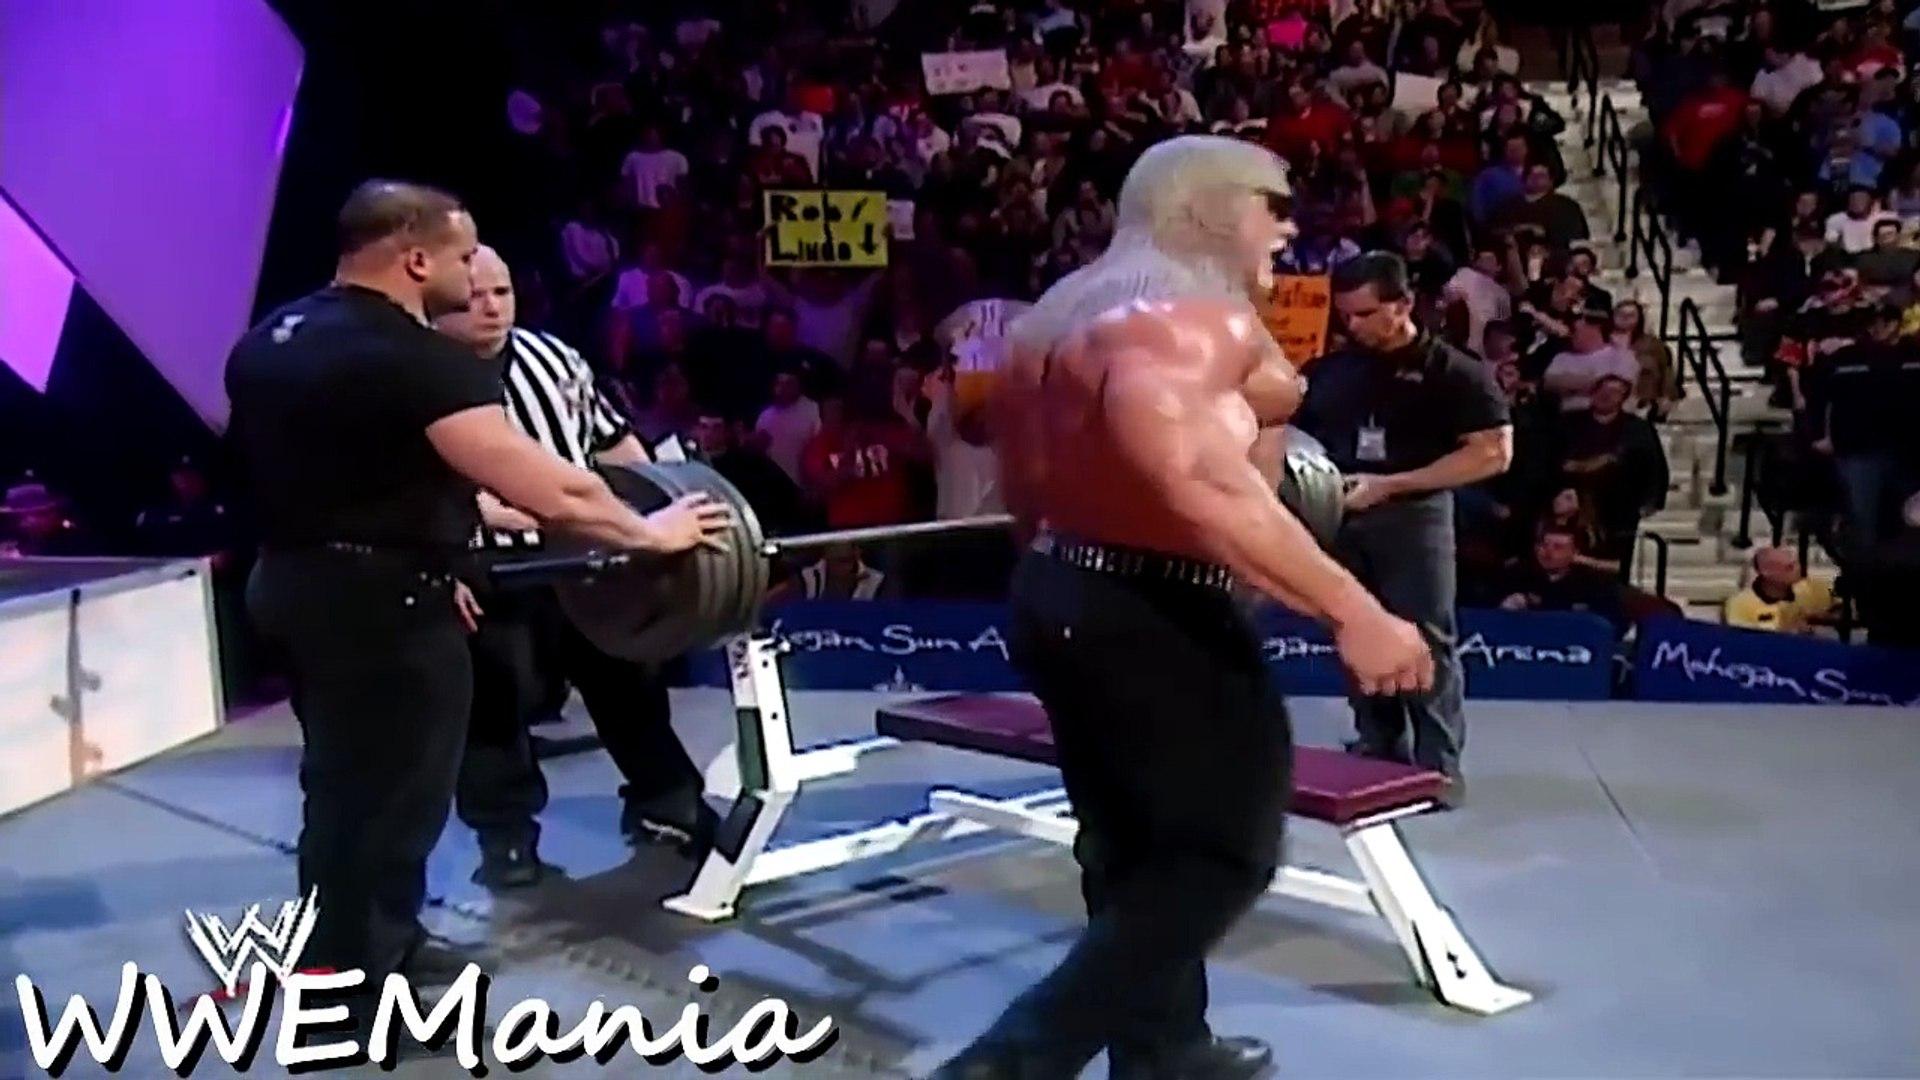 WWE SCOTT STEINER VS TRIPLE H - BENCH PRESS COMPETITION - RAW 2003 - WWE WWF Wrestling MMA Fighting